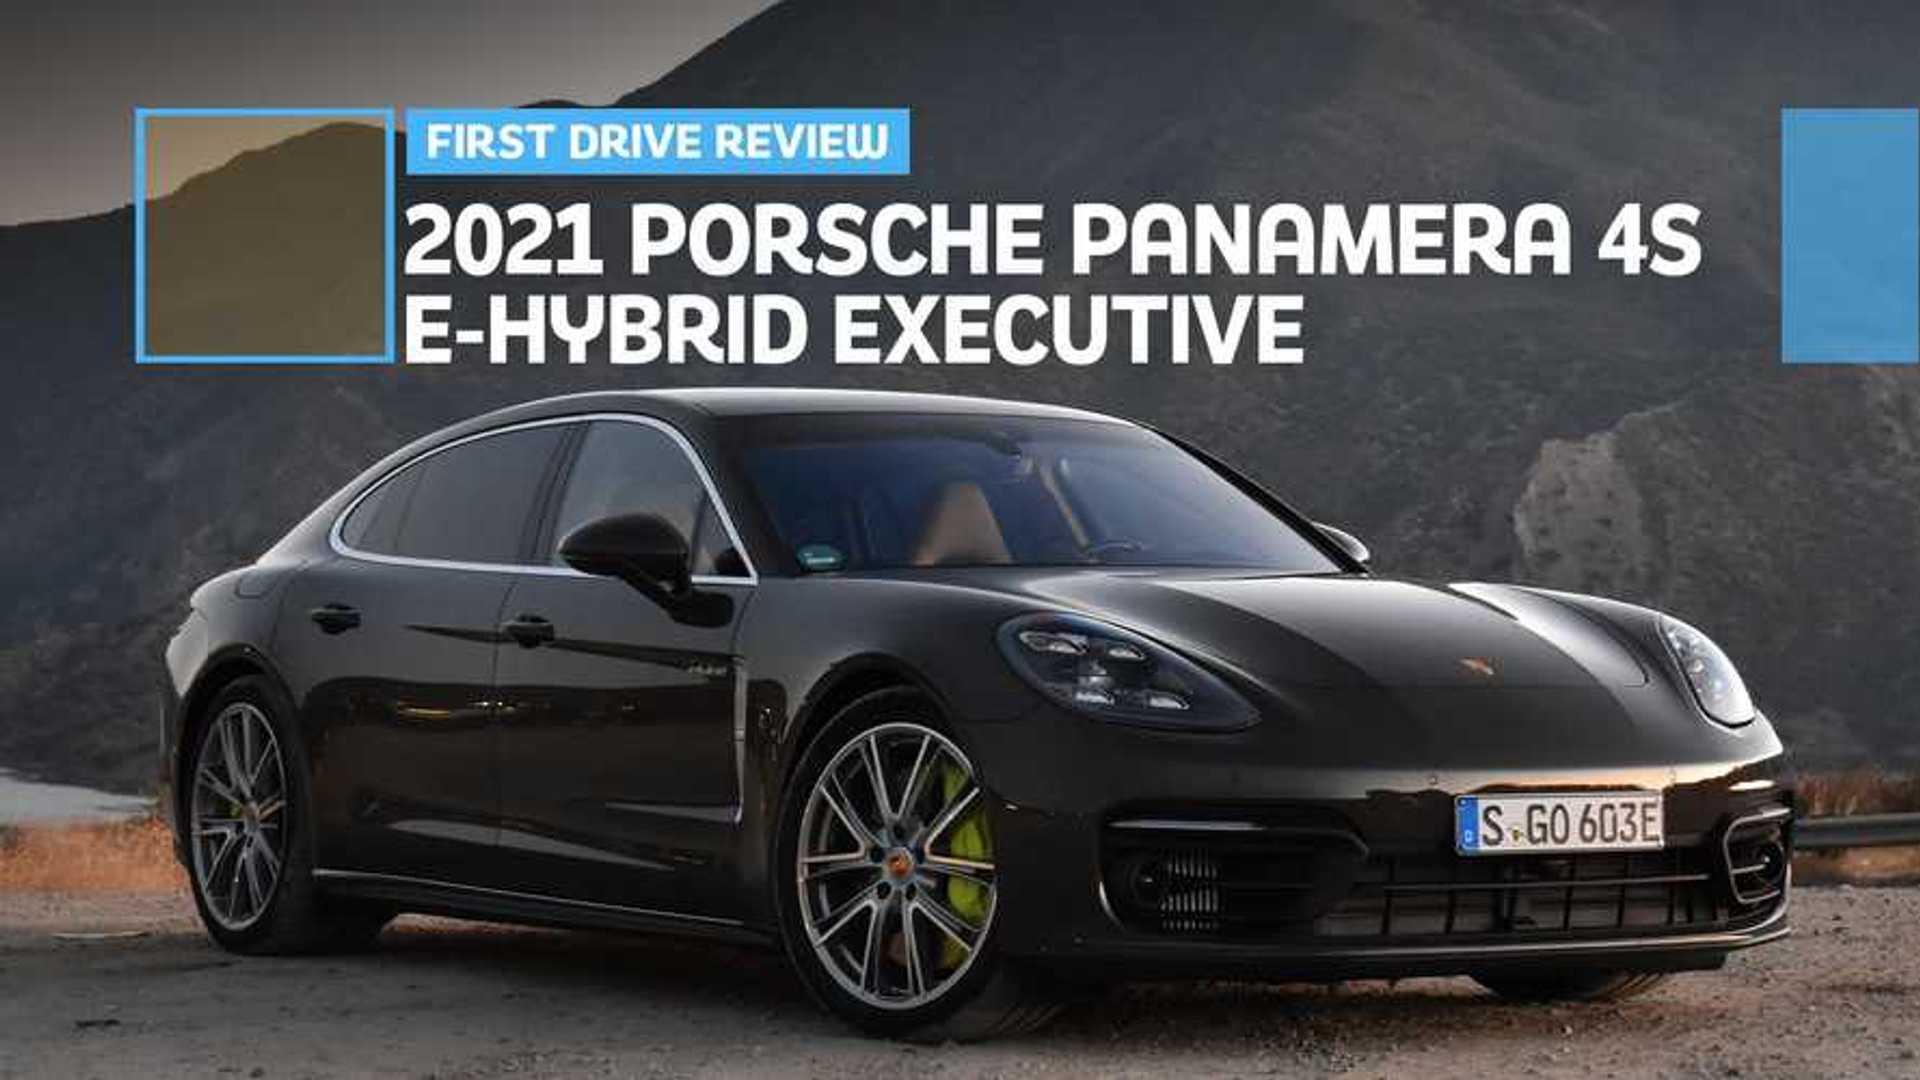 2021 Porsche Panamera 4S E-Hybrid Executive First Drive Review: Breathtaking